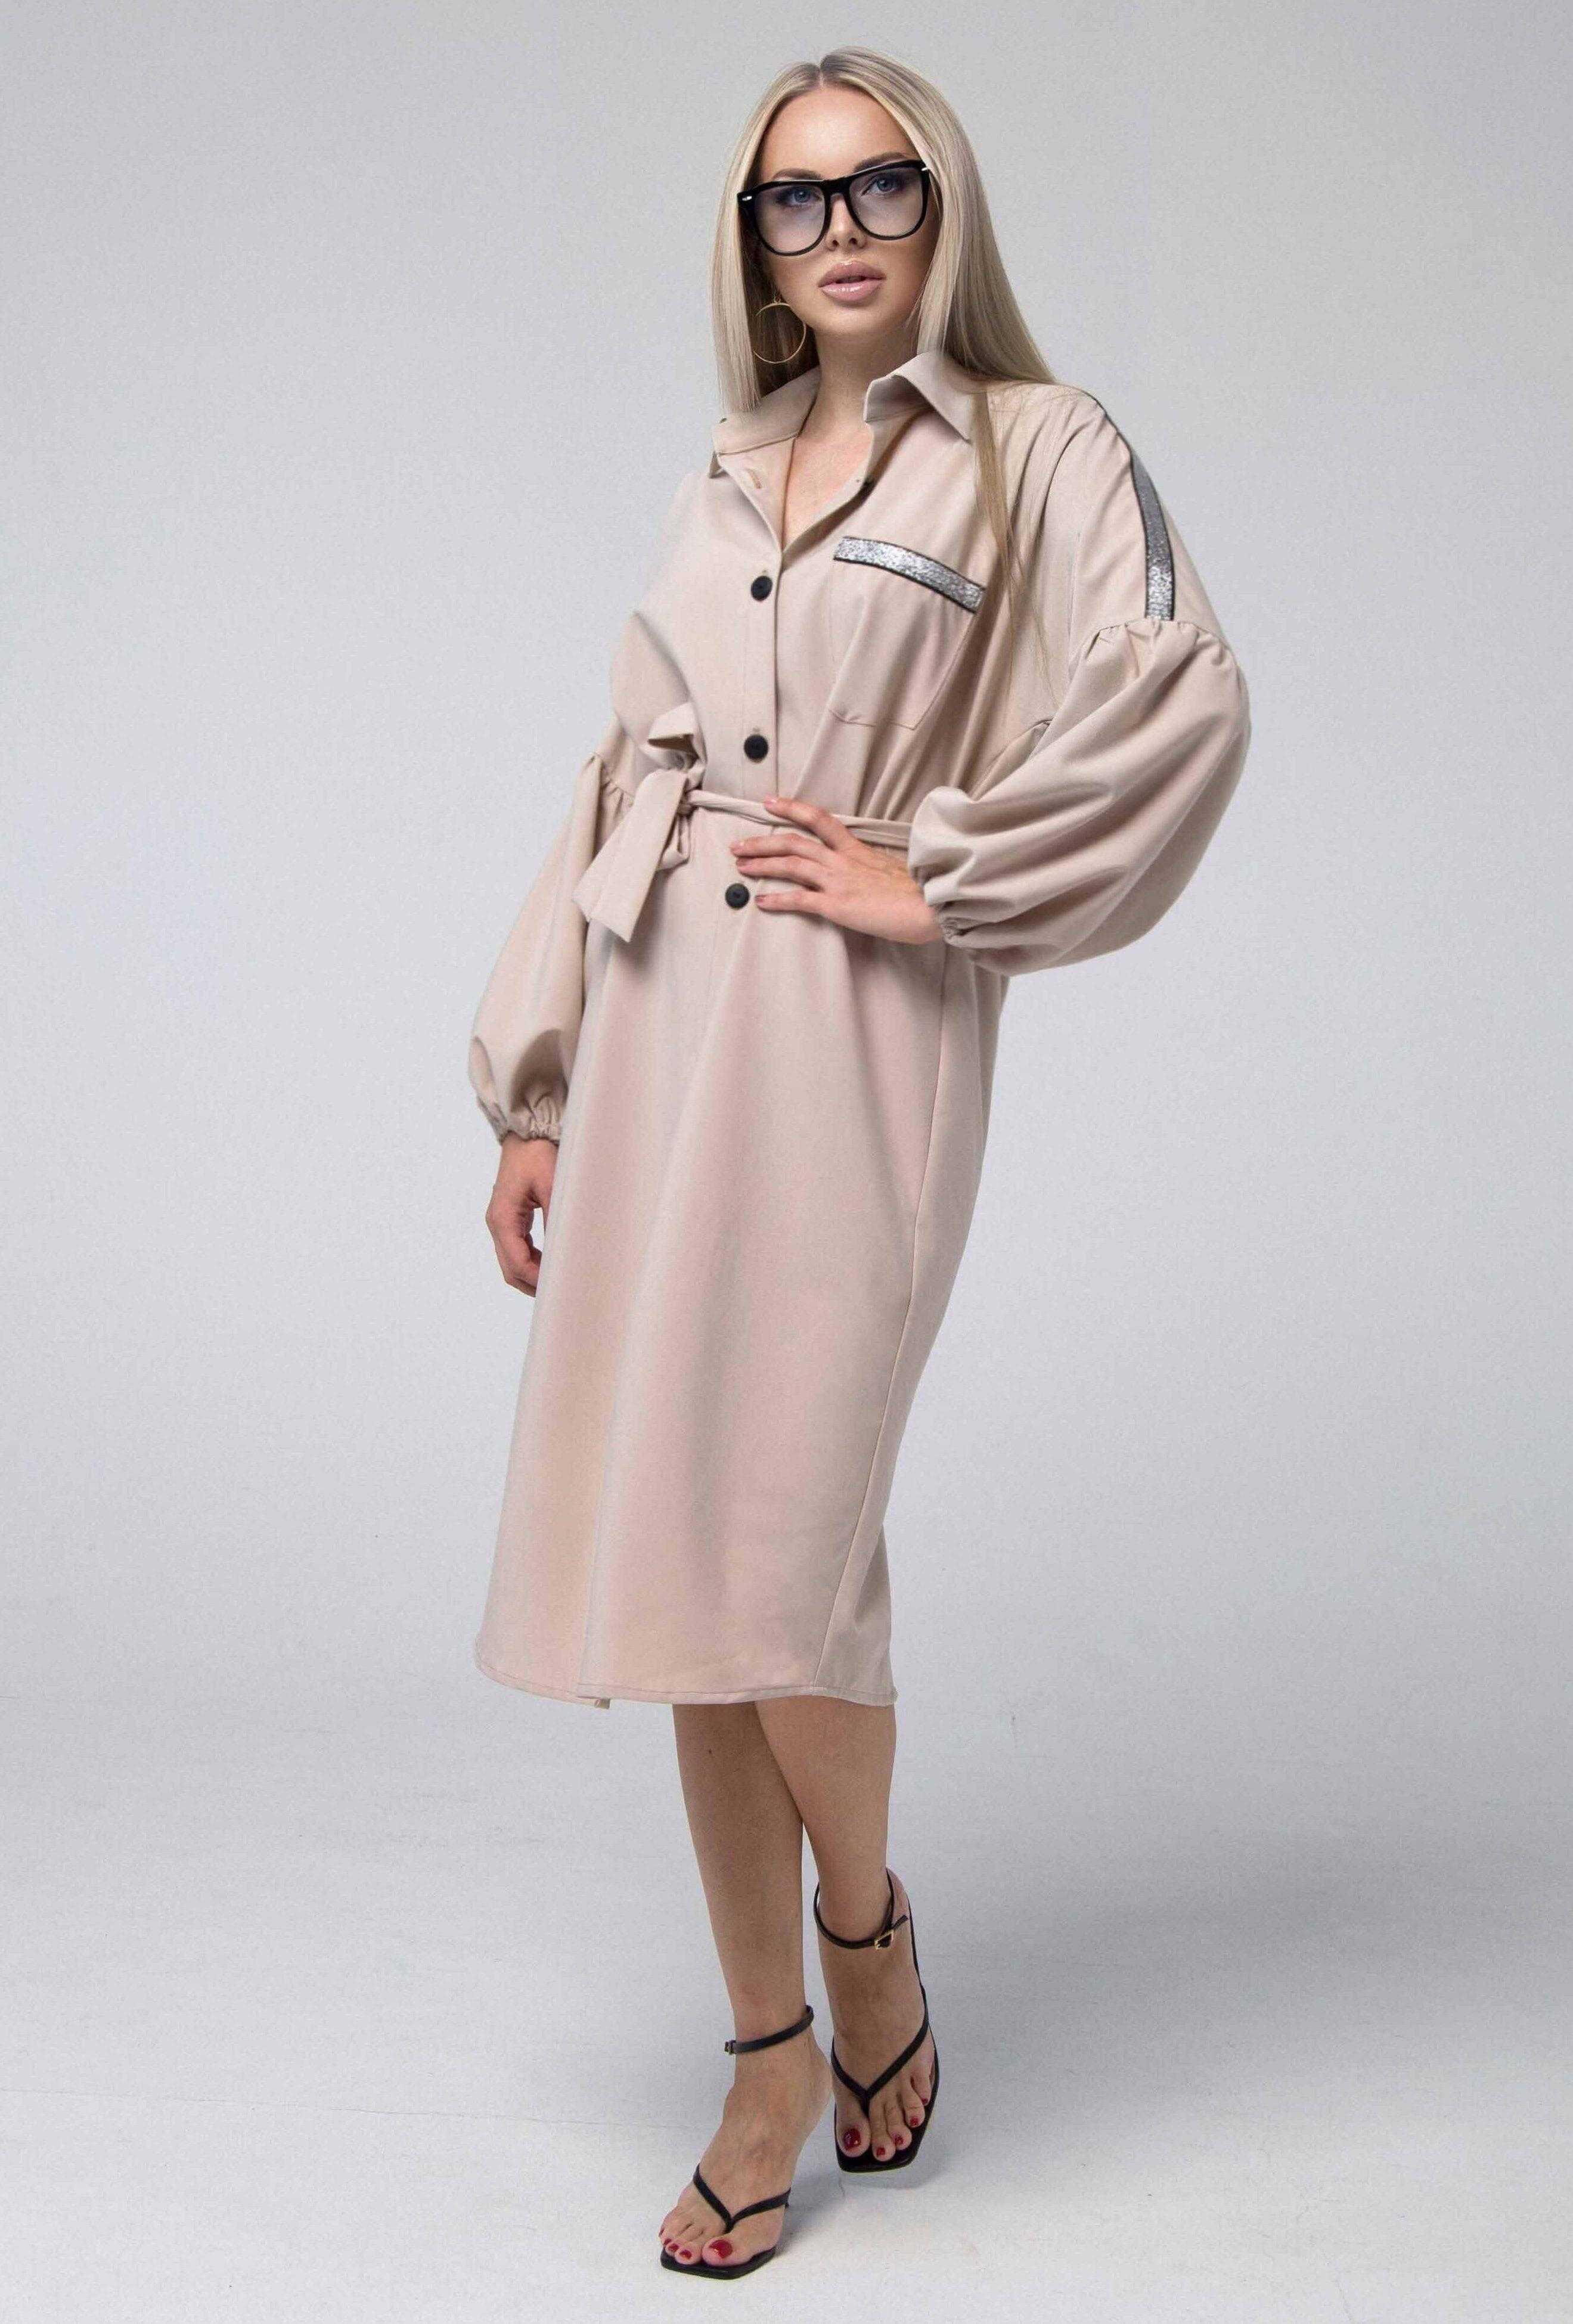 Платье рубашка миди (арт. ml 142)